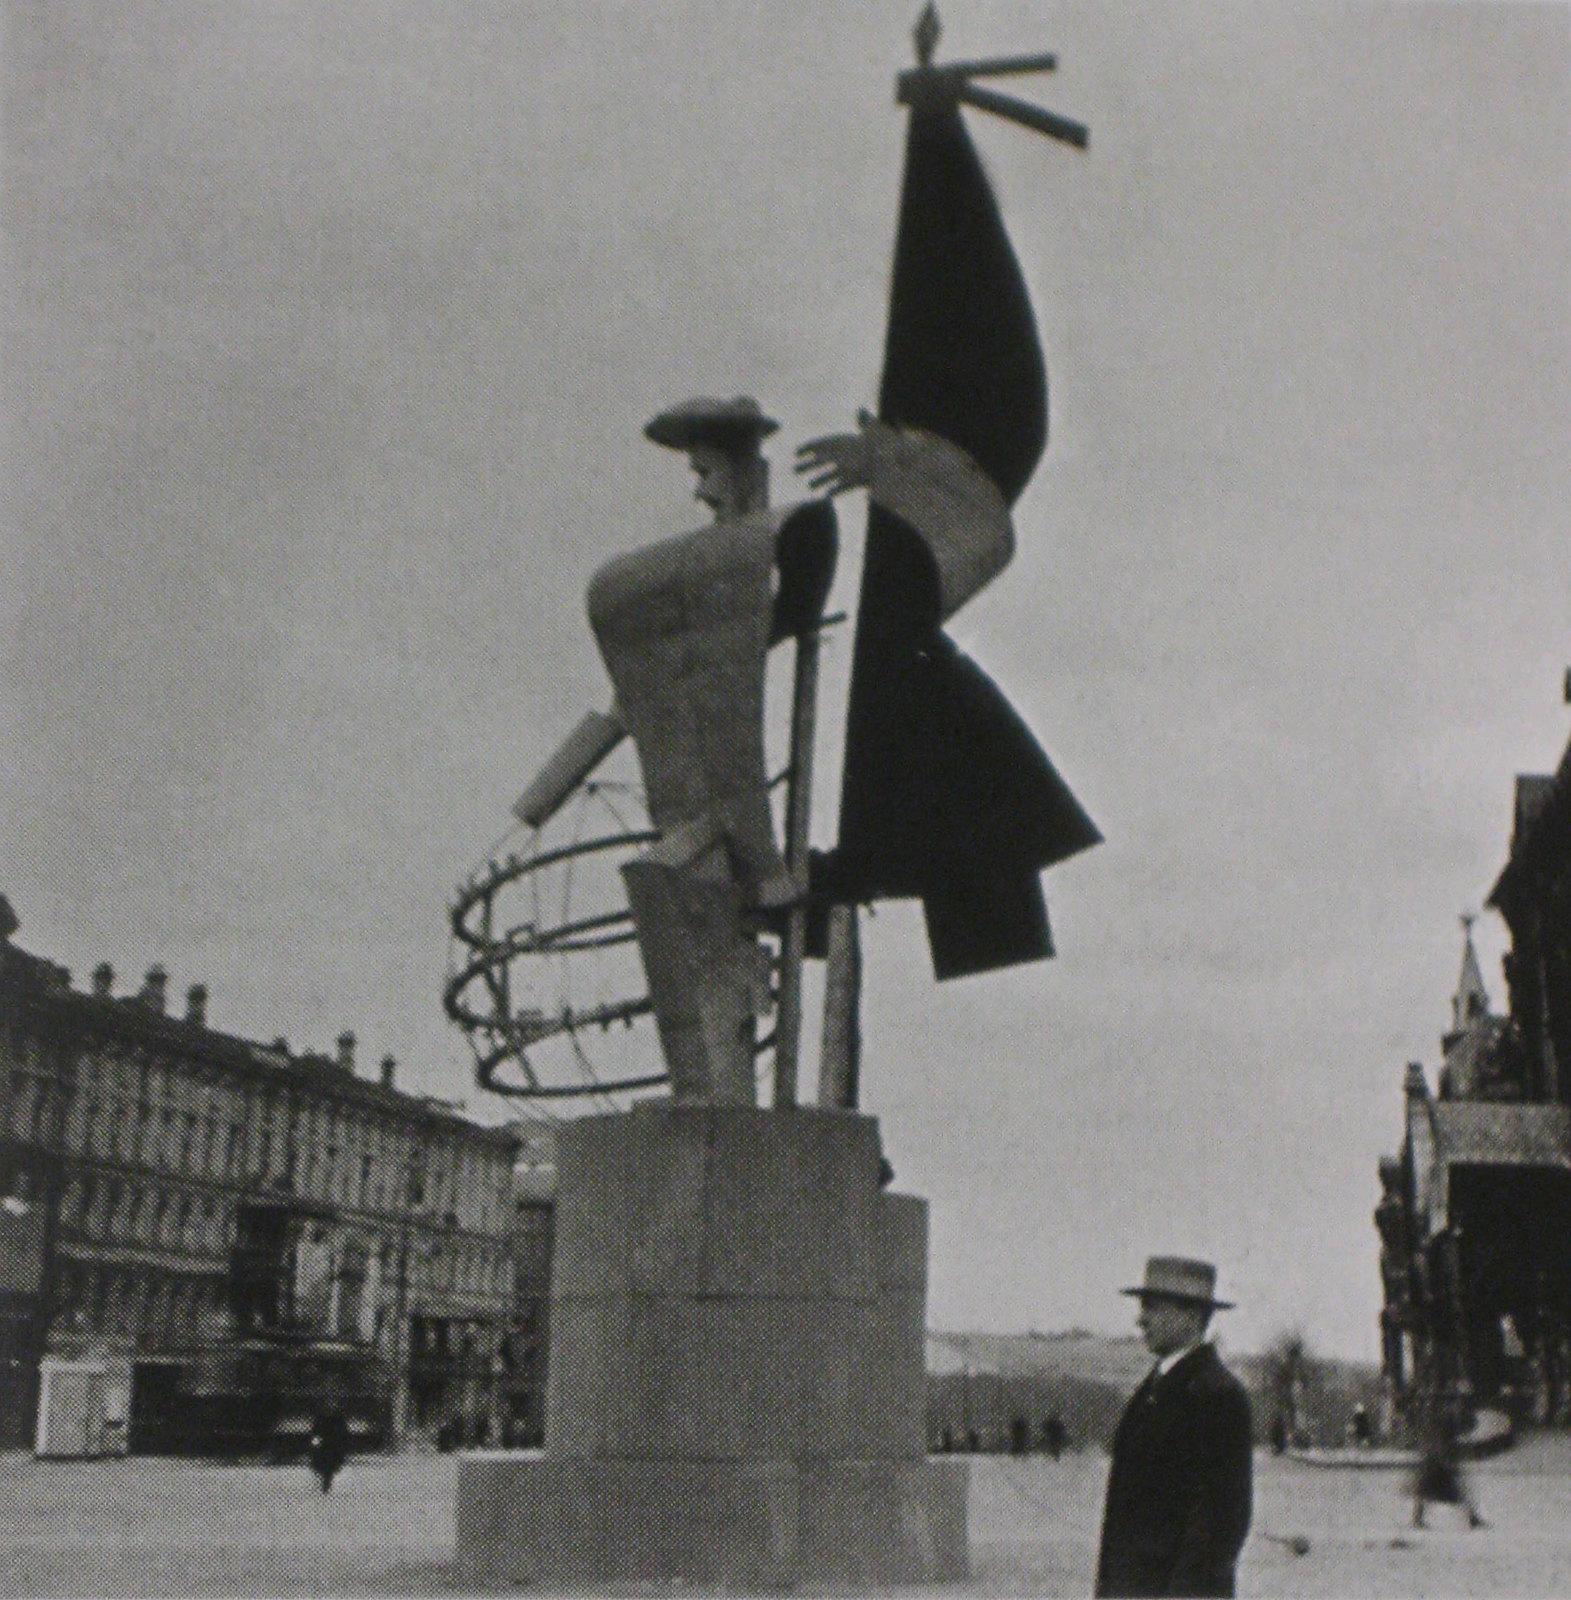 Constructivist propaganda figure, 1931 (photo by Ernst May)